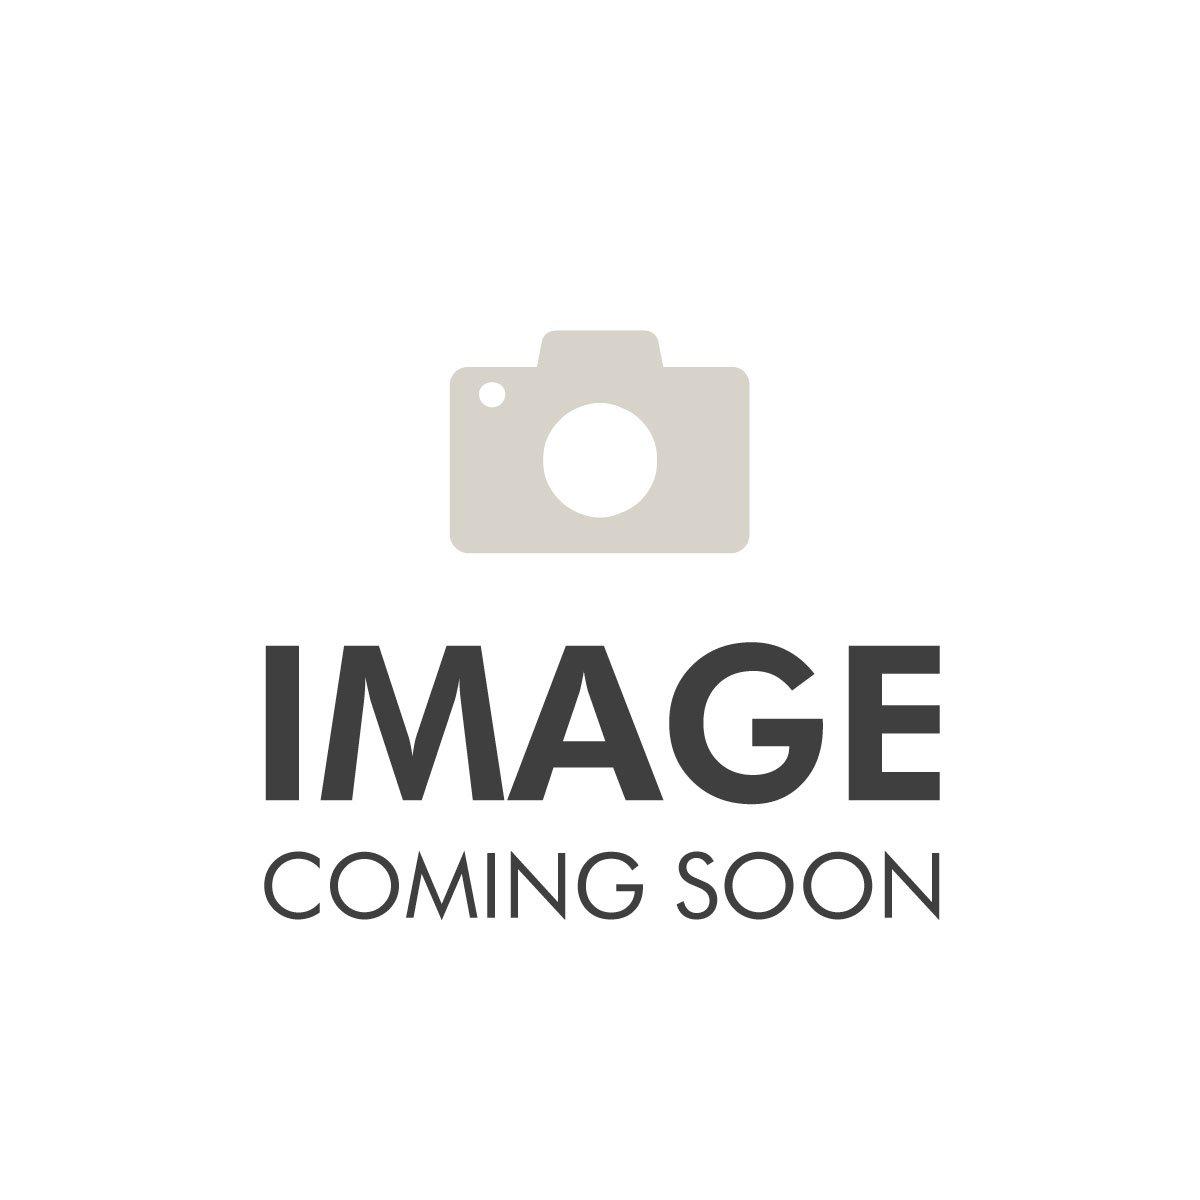 L'Oreal Youth Code Rejuvenating Anti-Wrinkle Eye Cream 15ml